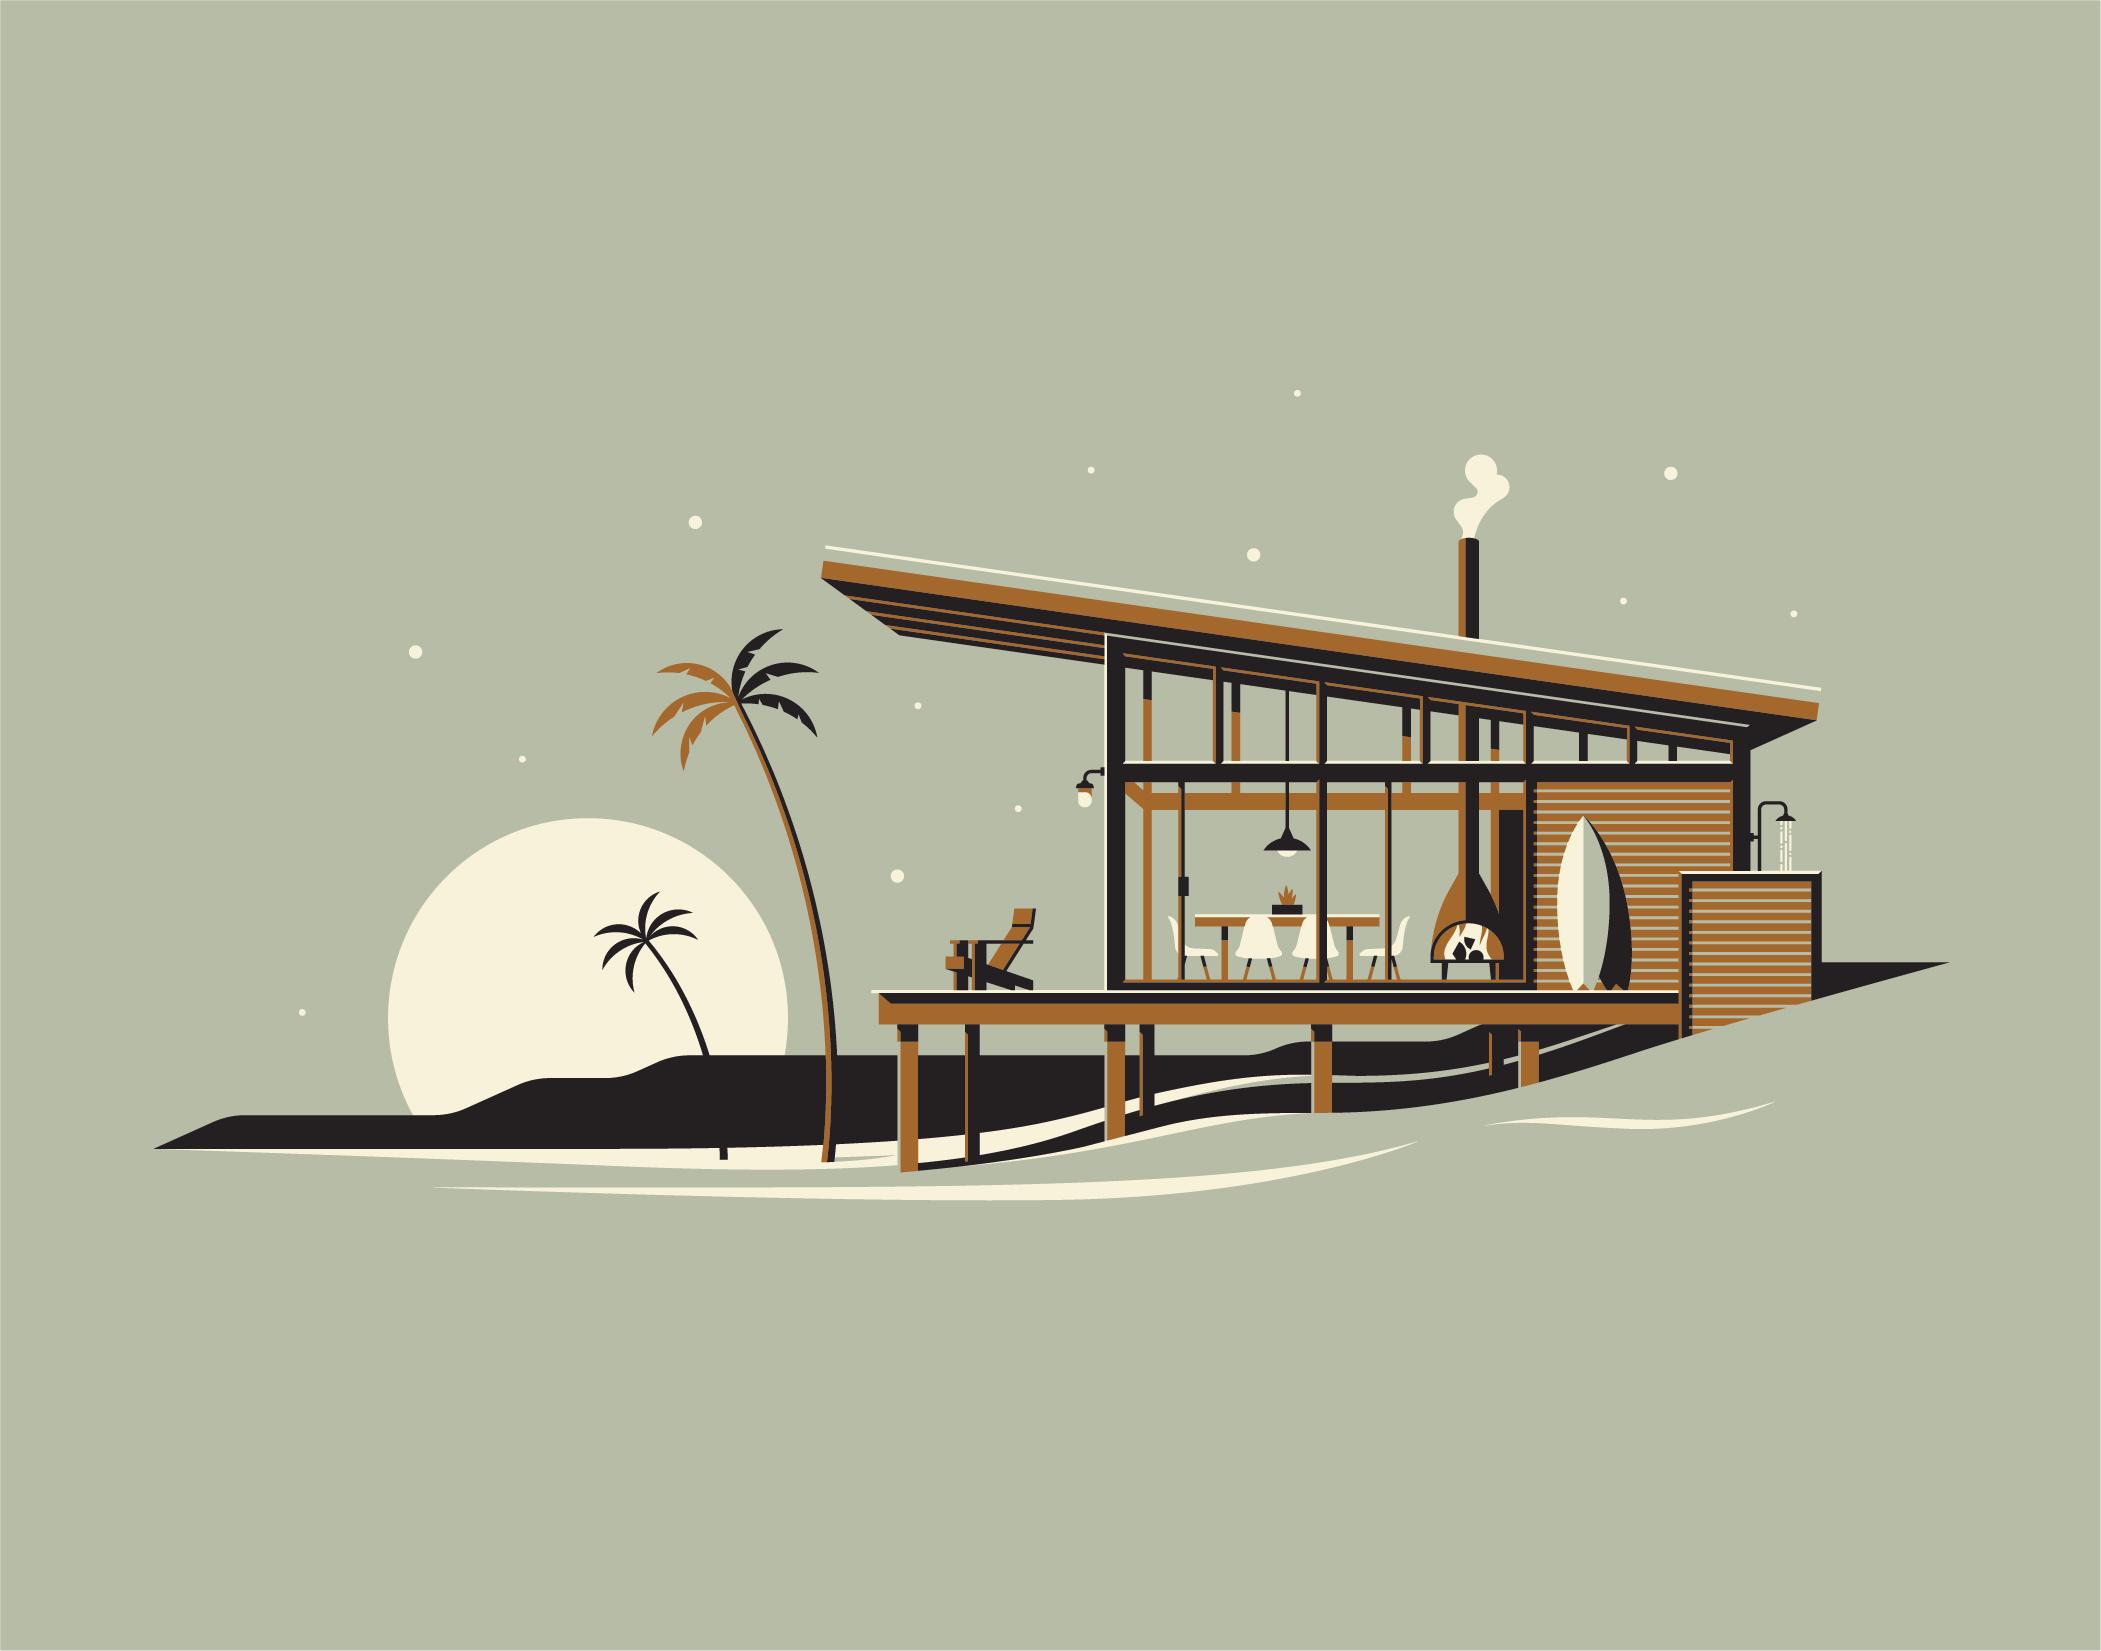 beach_cabin_seps_trapped-01.jpg